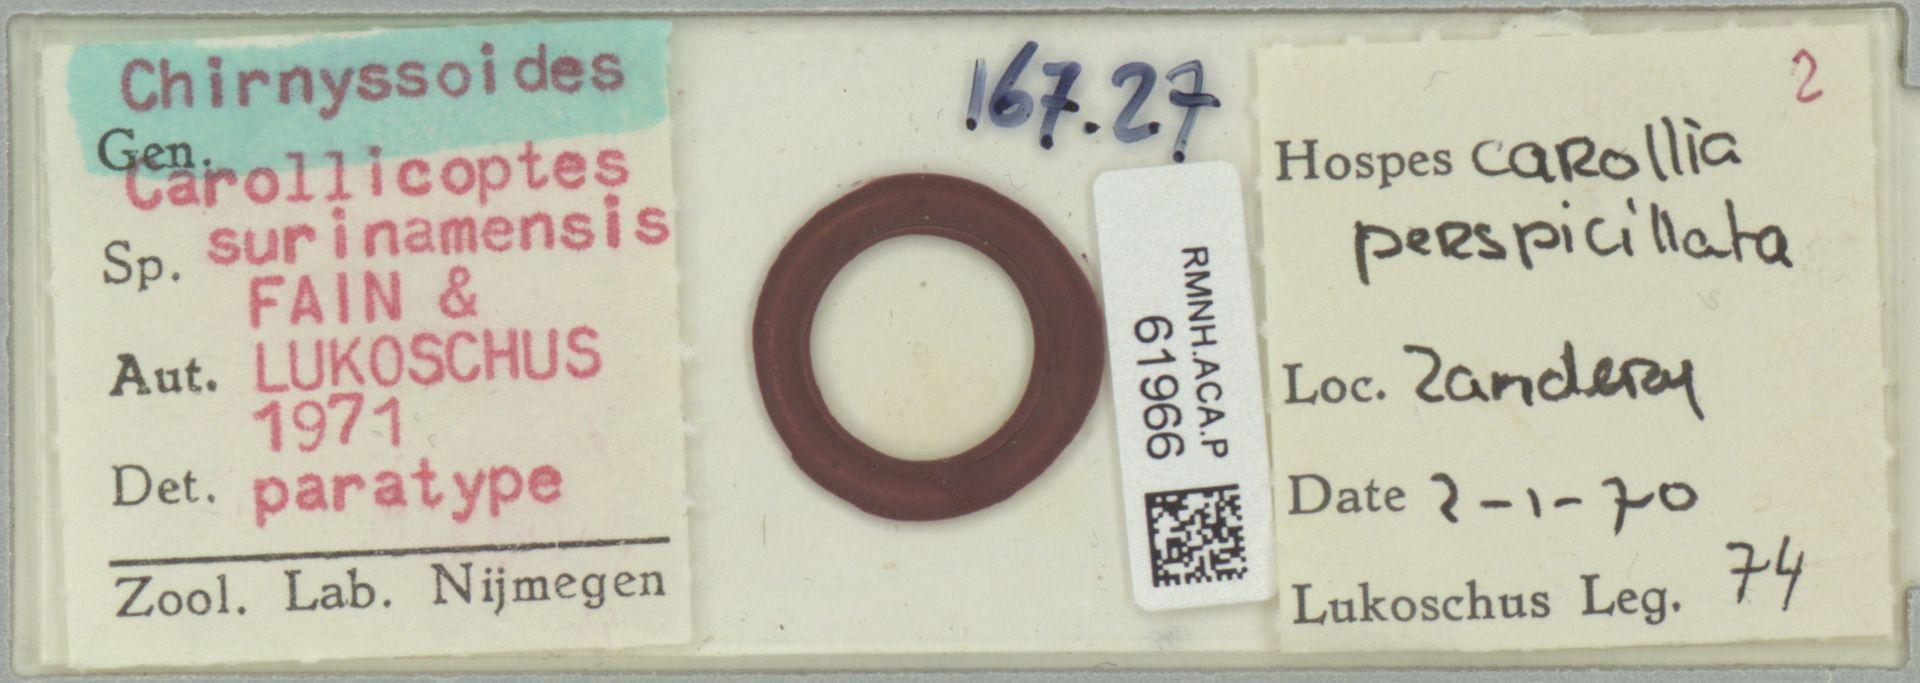 RMNH.ACA.P.61966 | Chirnyssoides carollicoptes surinamensis Fain & Lukoschus 1971